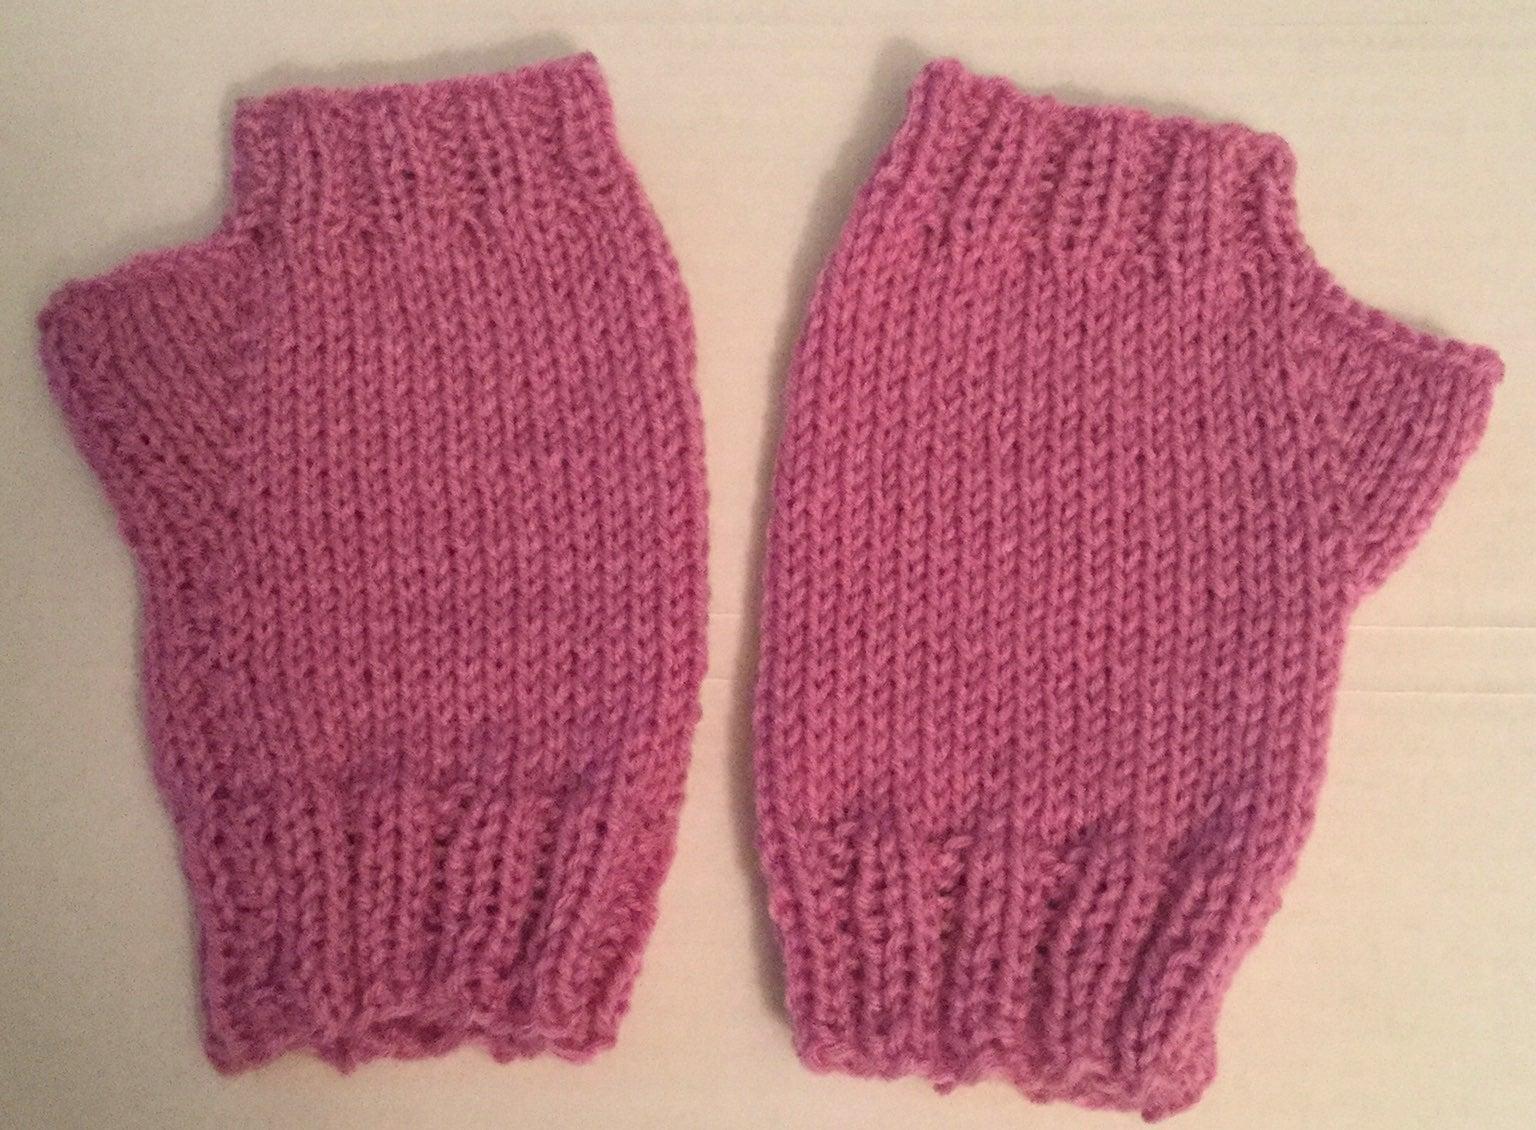 Medium/ large fingerless hand mitts, adu